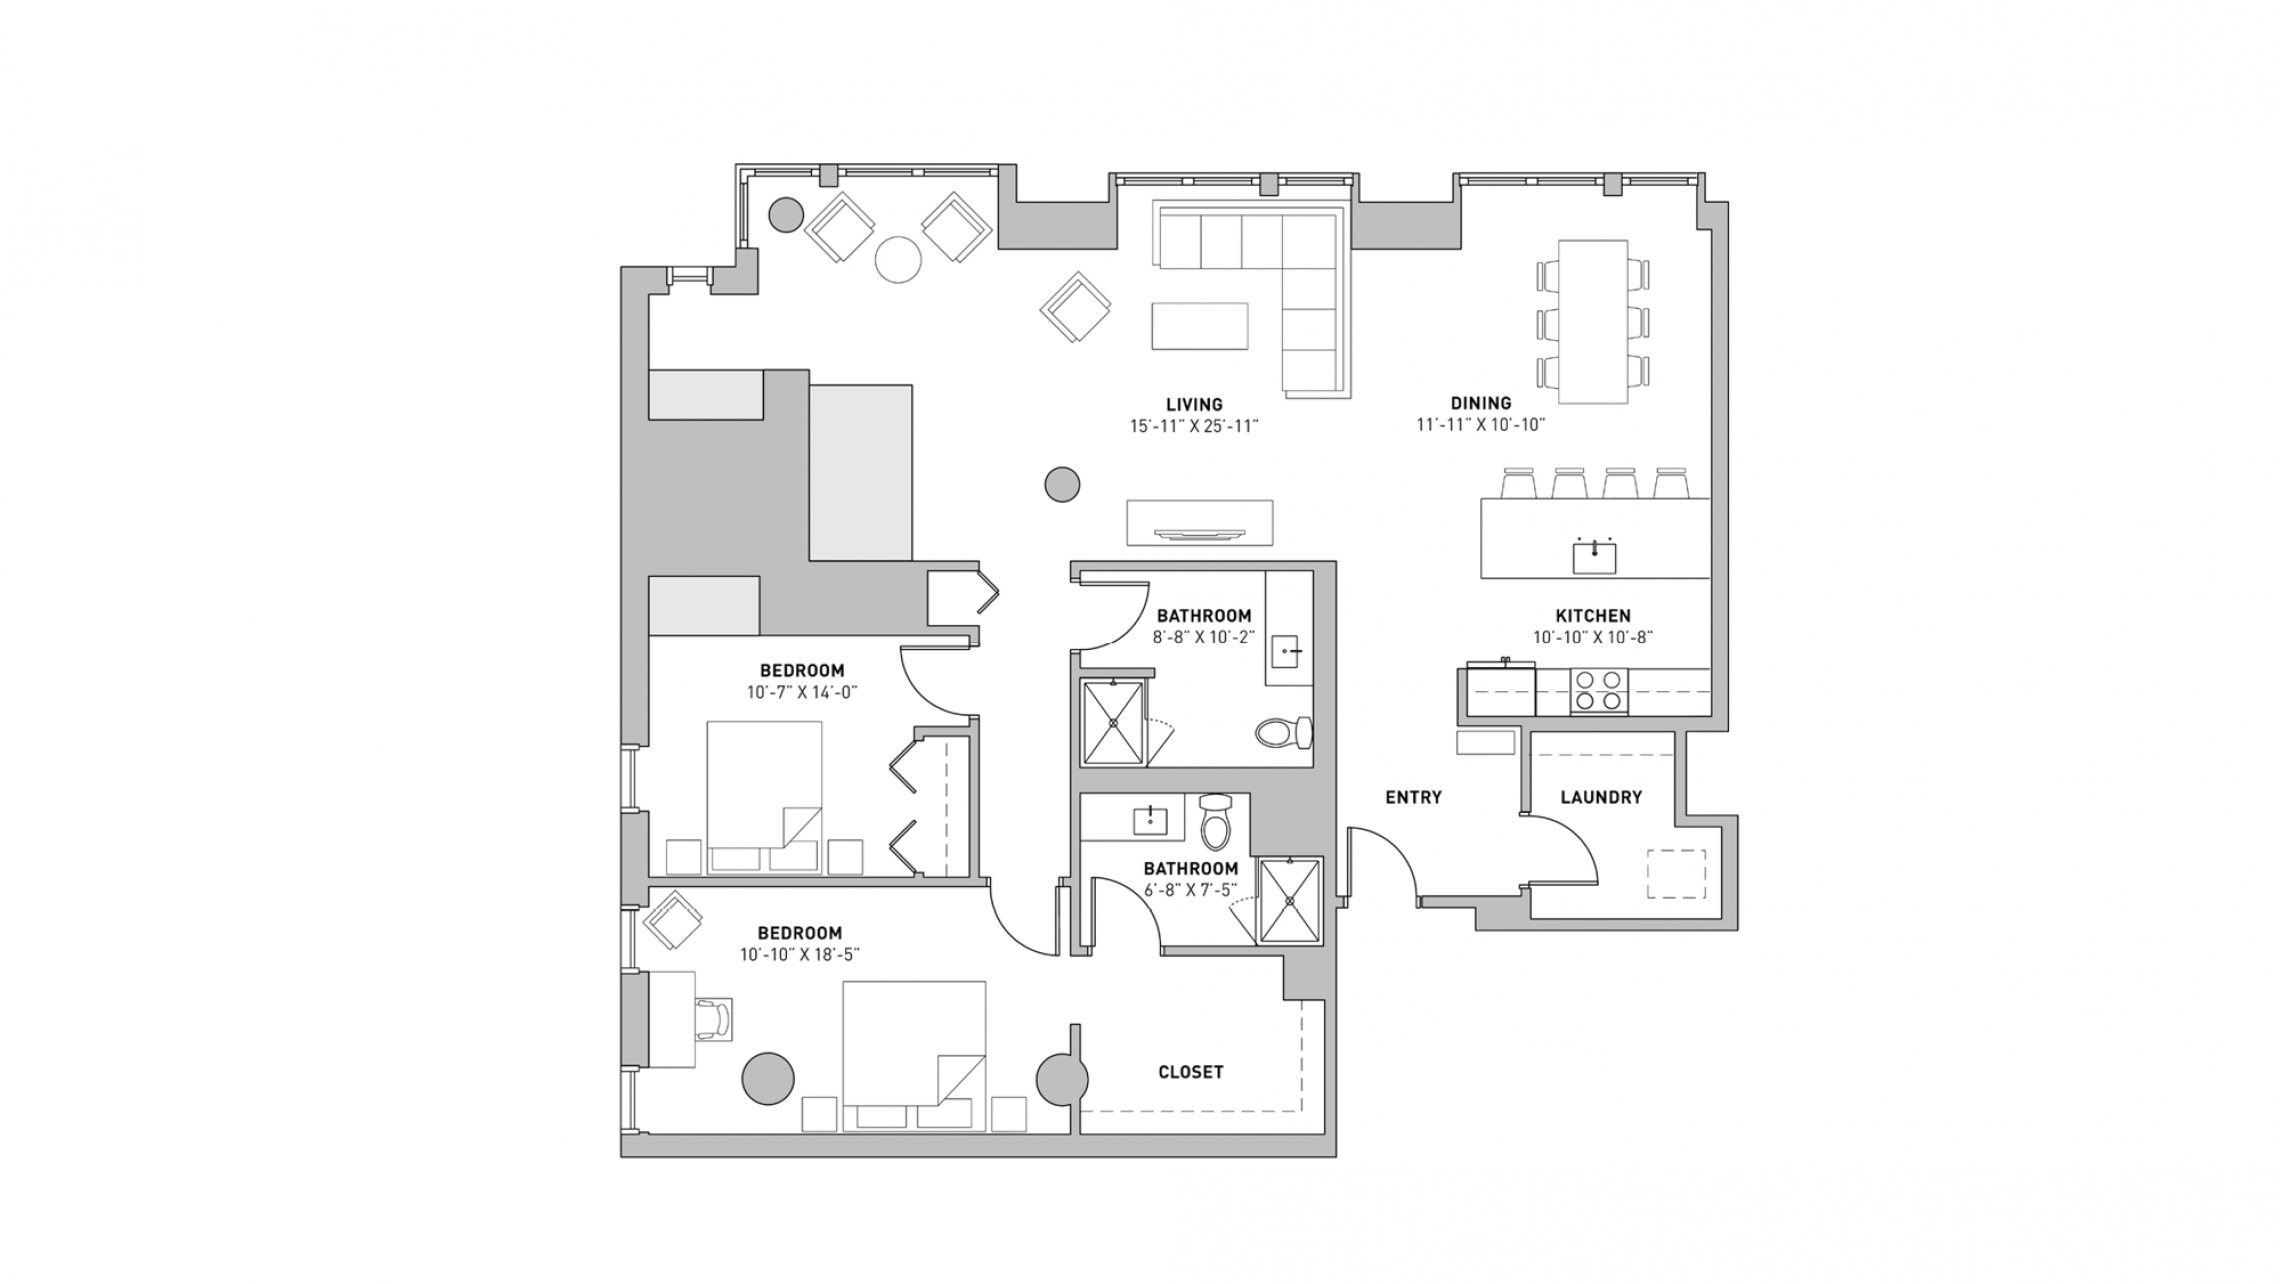 ULI The Pressman 201 - Two Bedroom, Two Bathroom